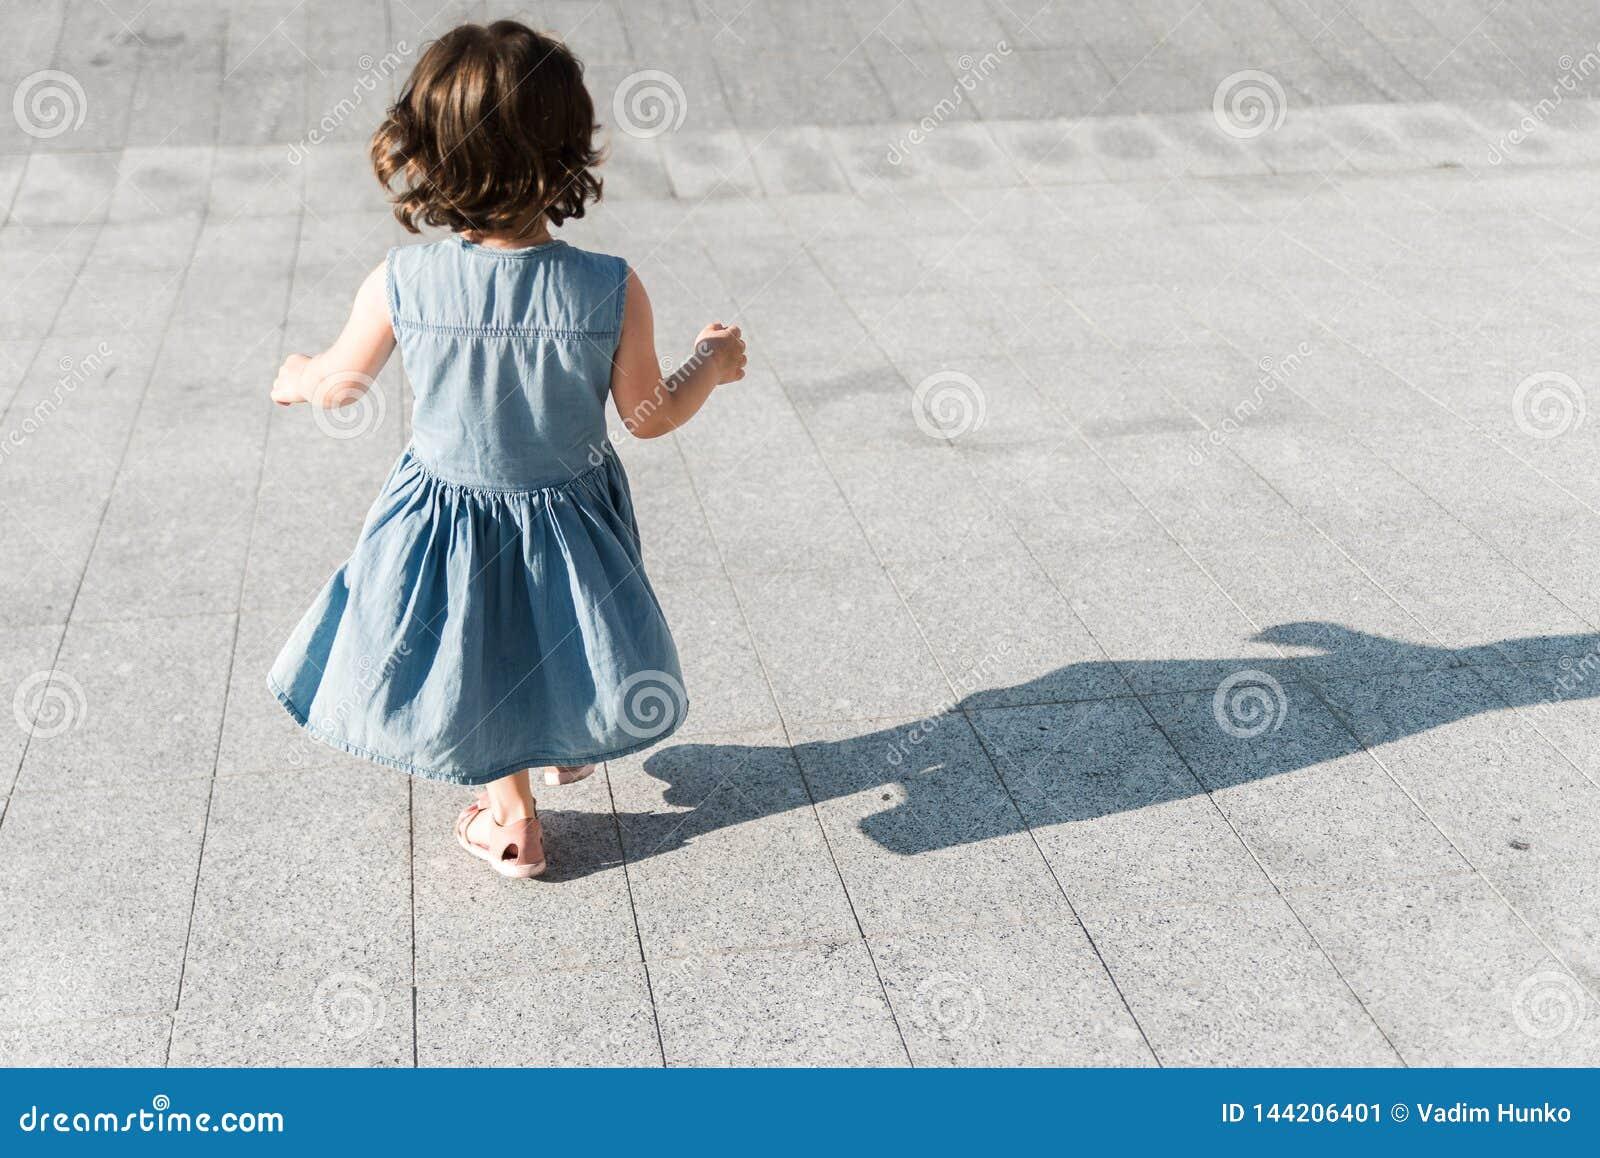 Childhood concept. Cute preschool girl is running